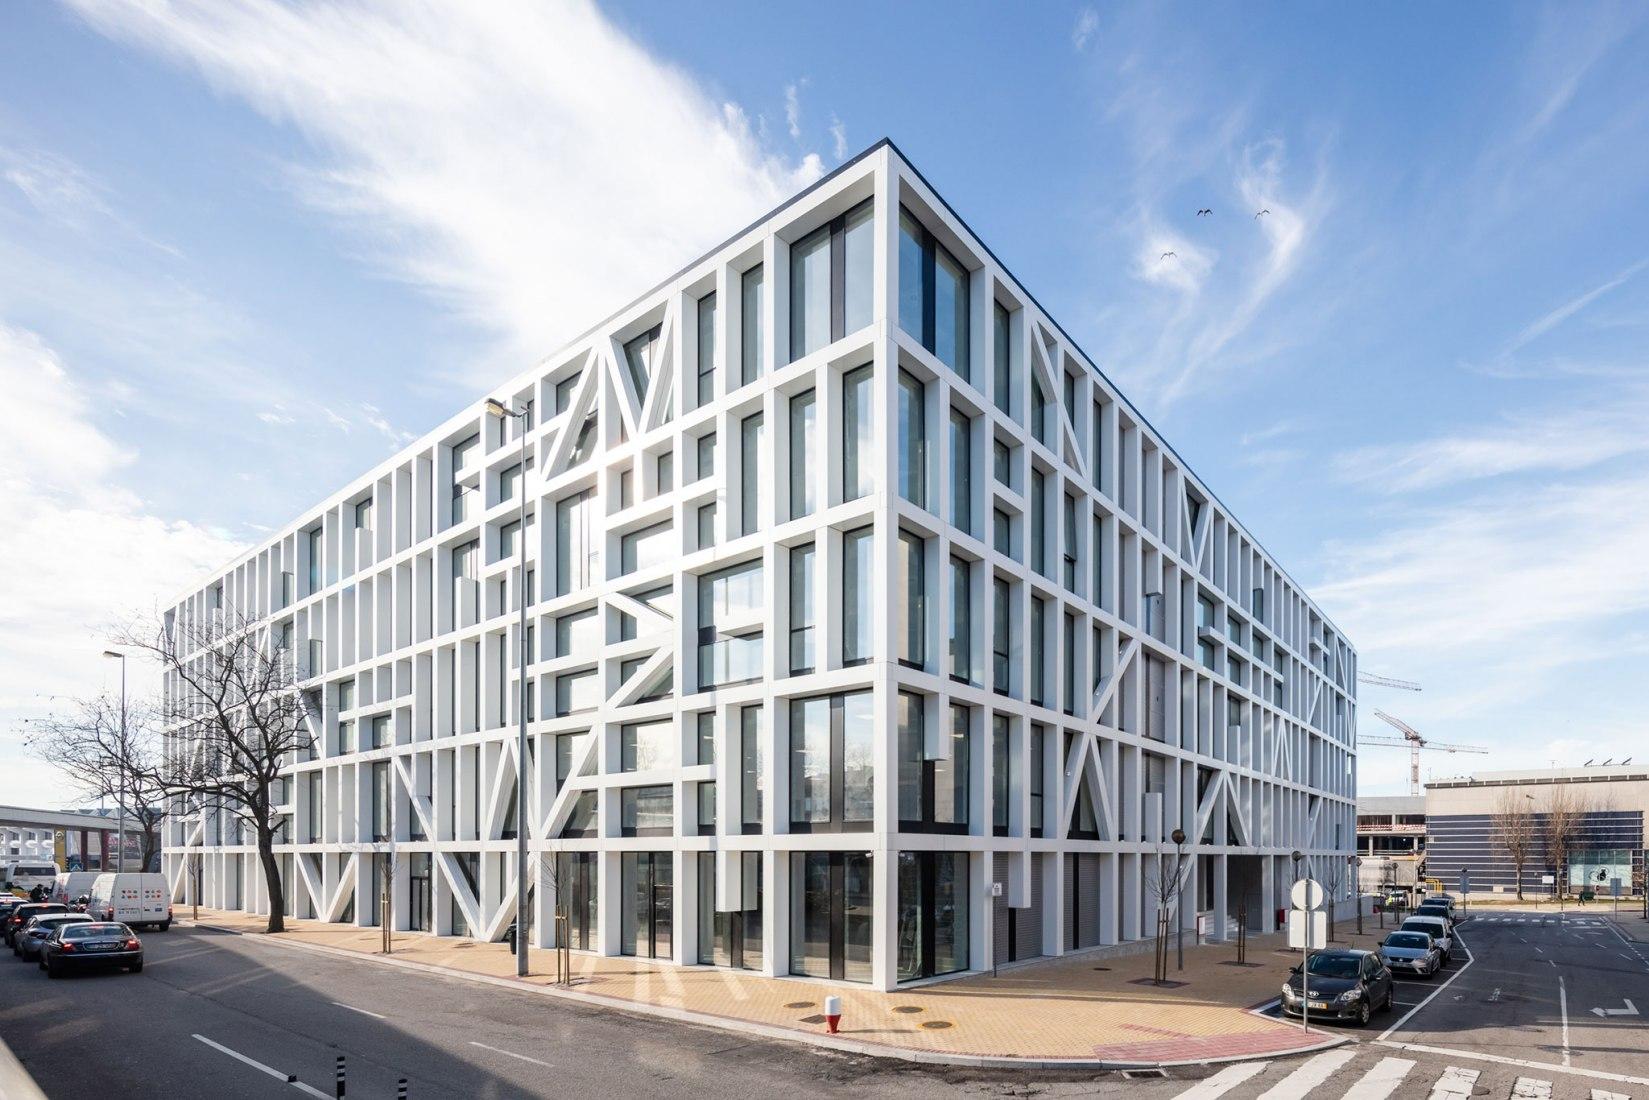 Urbo Business Centre by Nuno Capa Arquitecto. Photograph by Joao Morgado Architecture Photography.